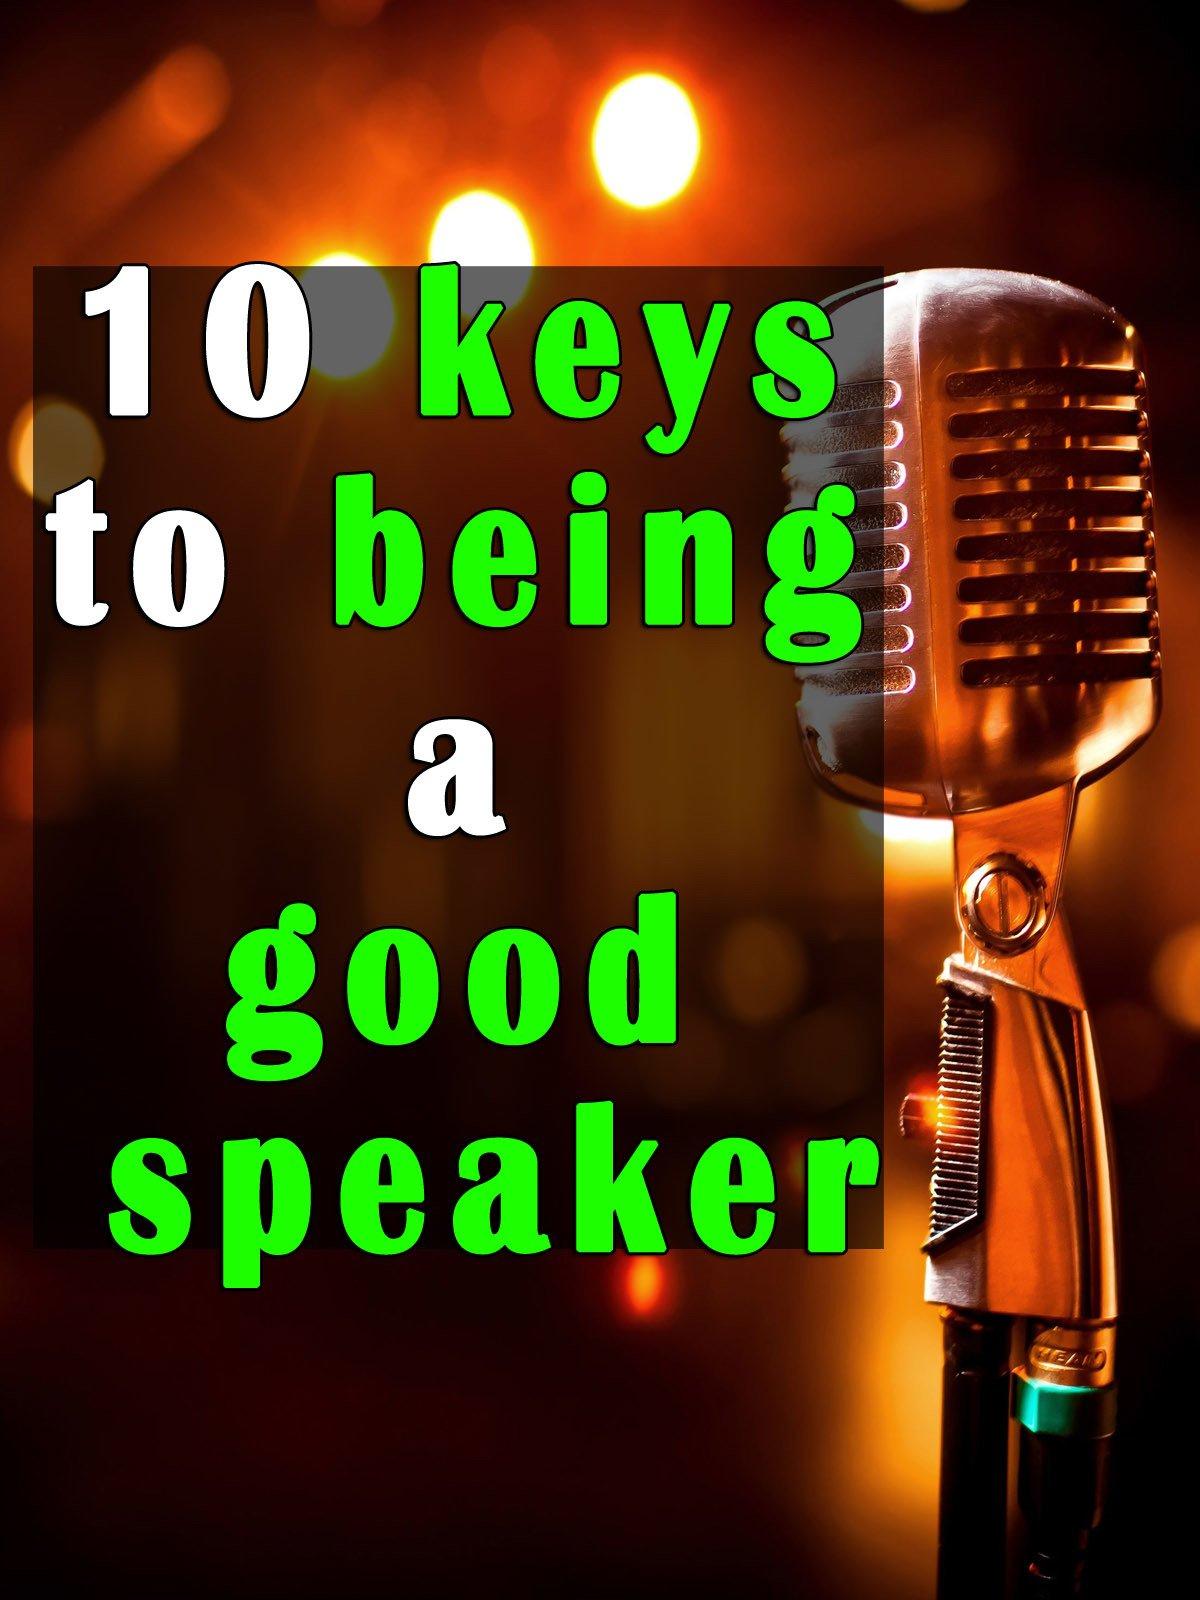 10 keys to being a good speaker